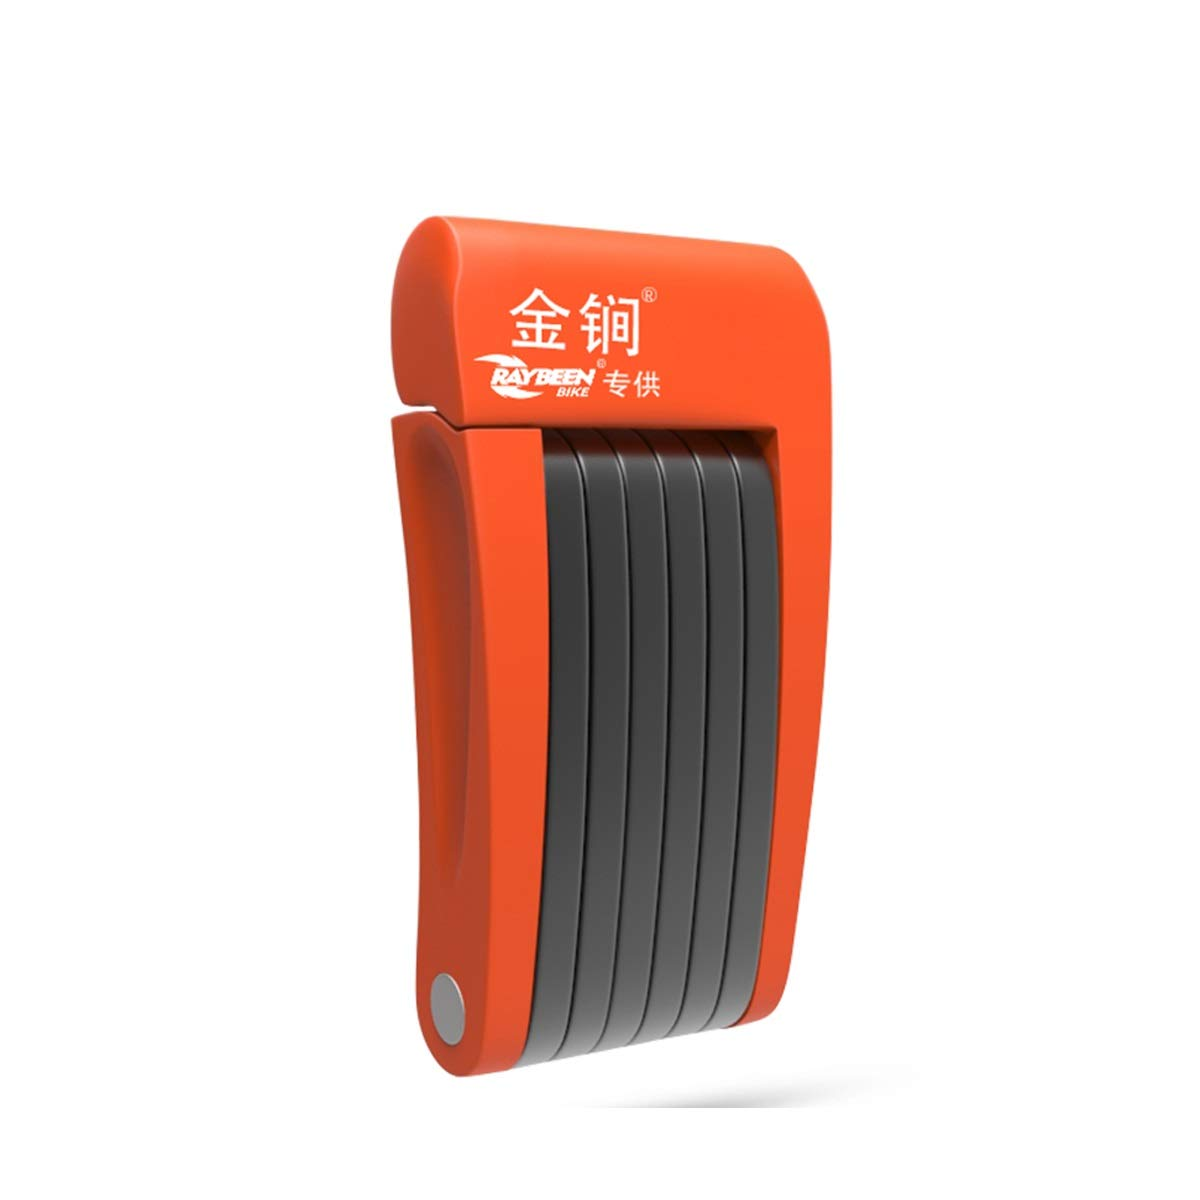 ZHONGYUE Bicycle Lock, Mountain Bike Password Lock, Anti-Theft Lock, Foldable Lock, Bundled Space 20CM (Color : Orange)